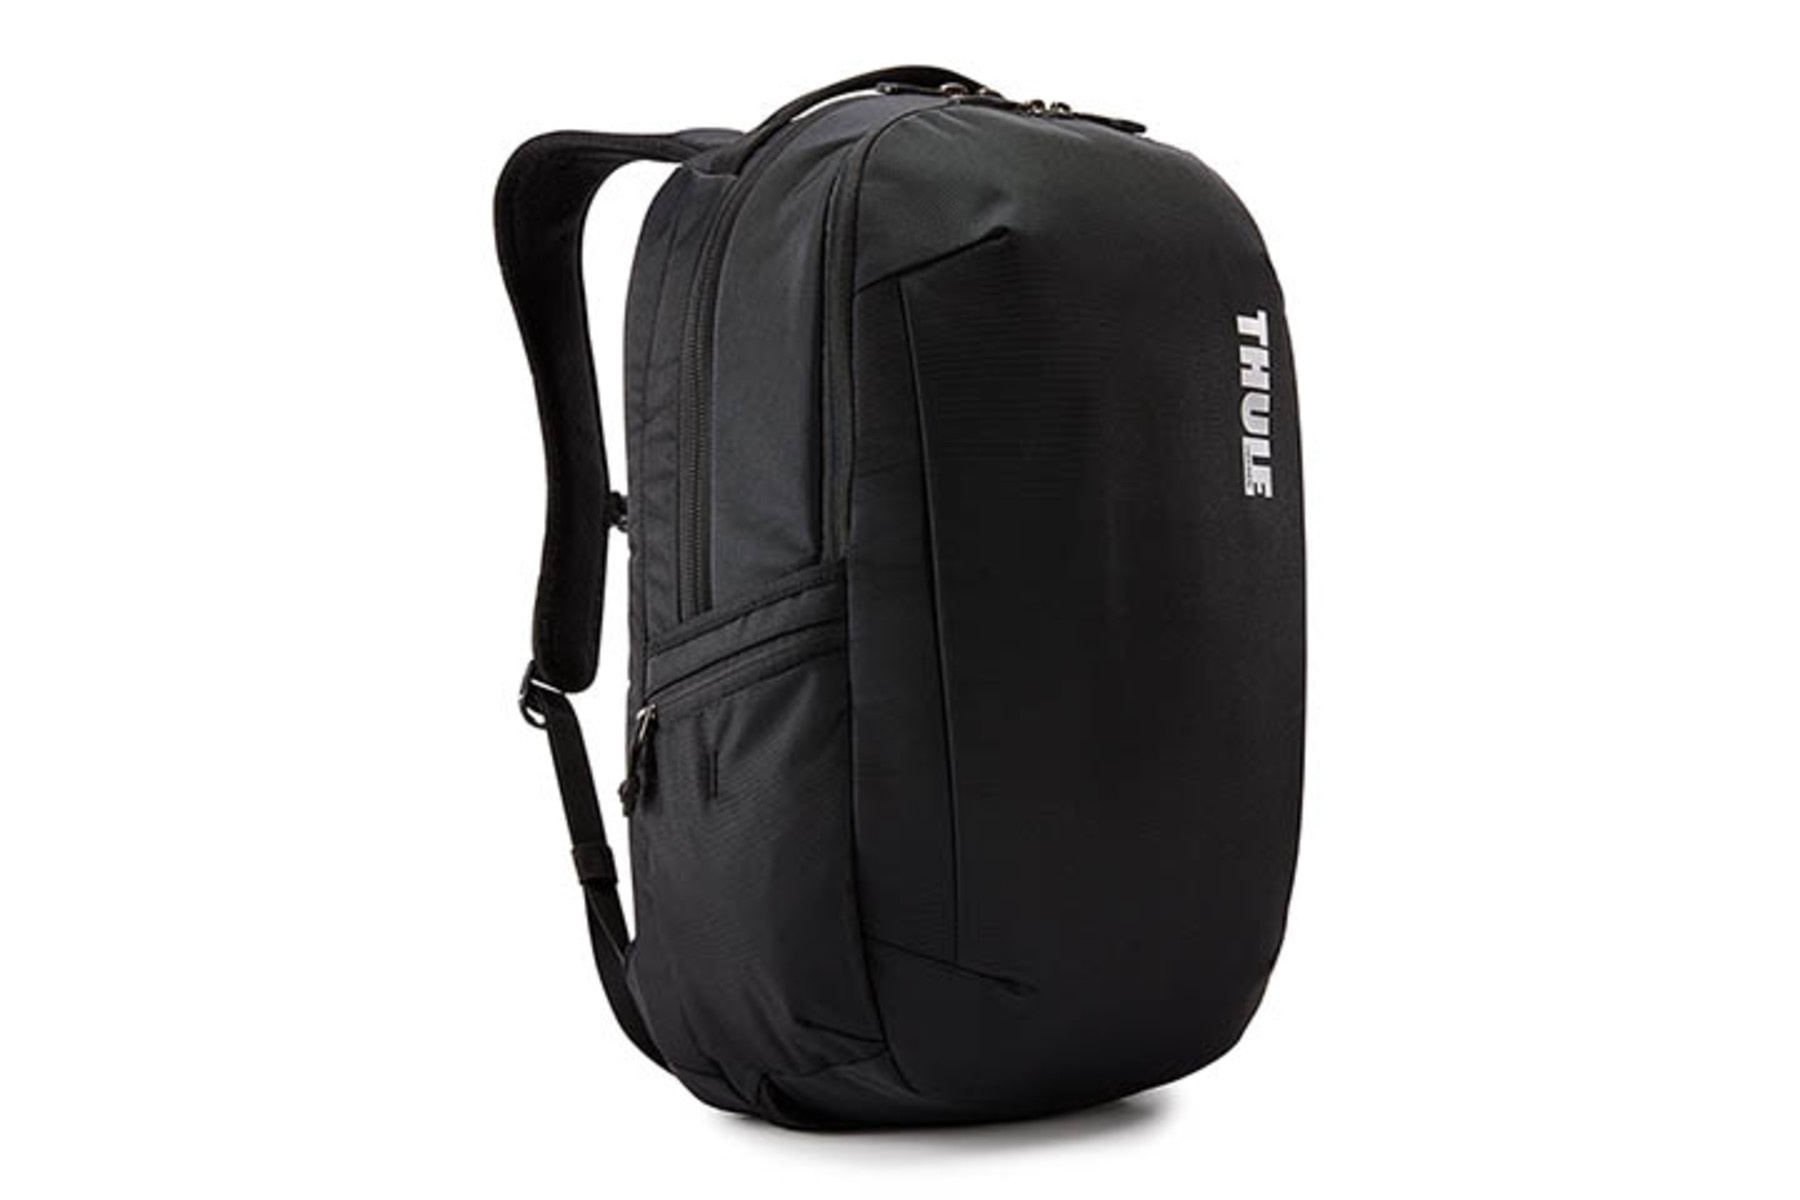 Thule Subterra 30 Litre Backpack (Black)